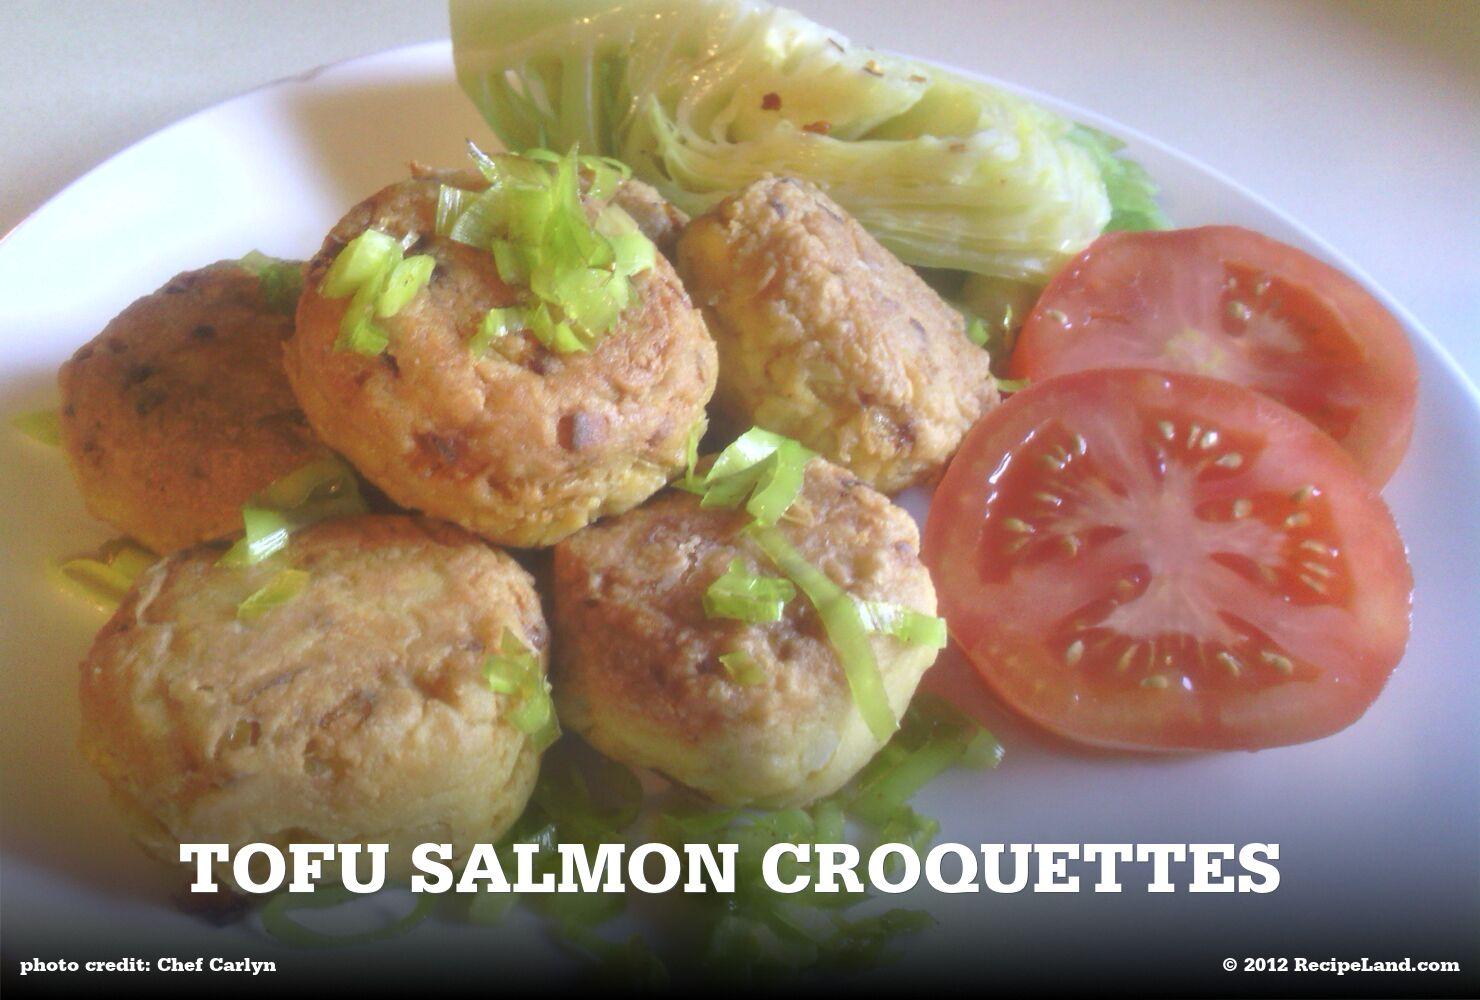 Tofu Salmon Croquettes